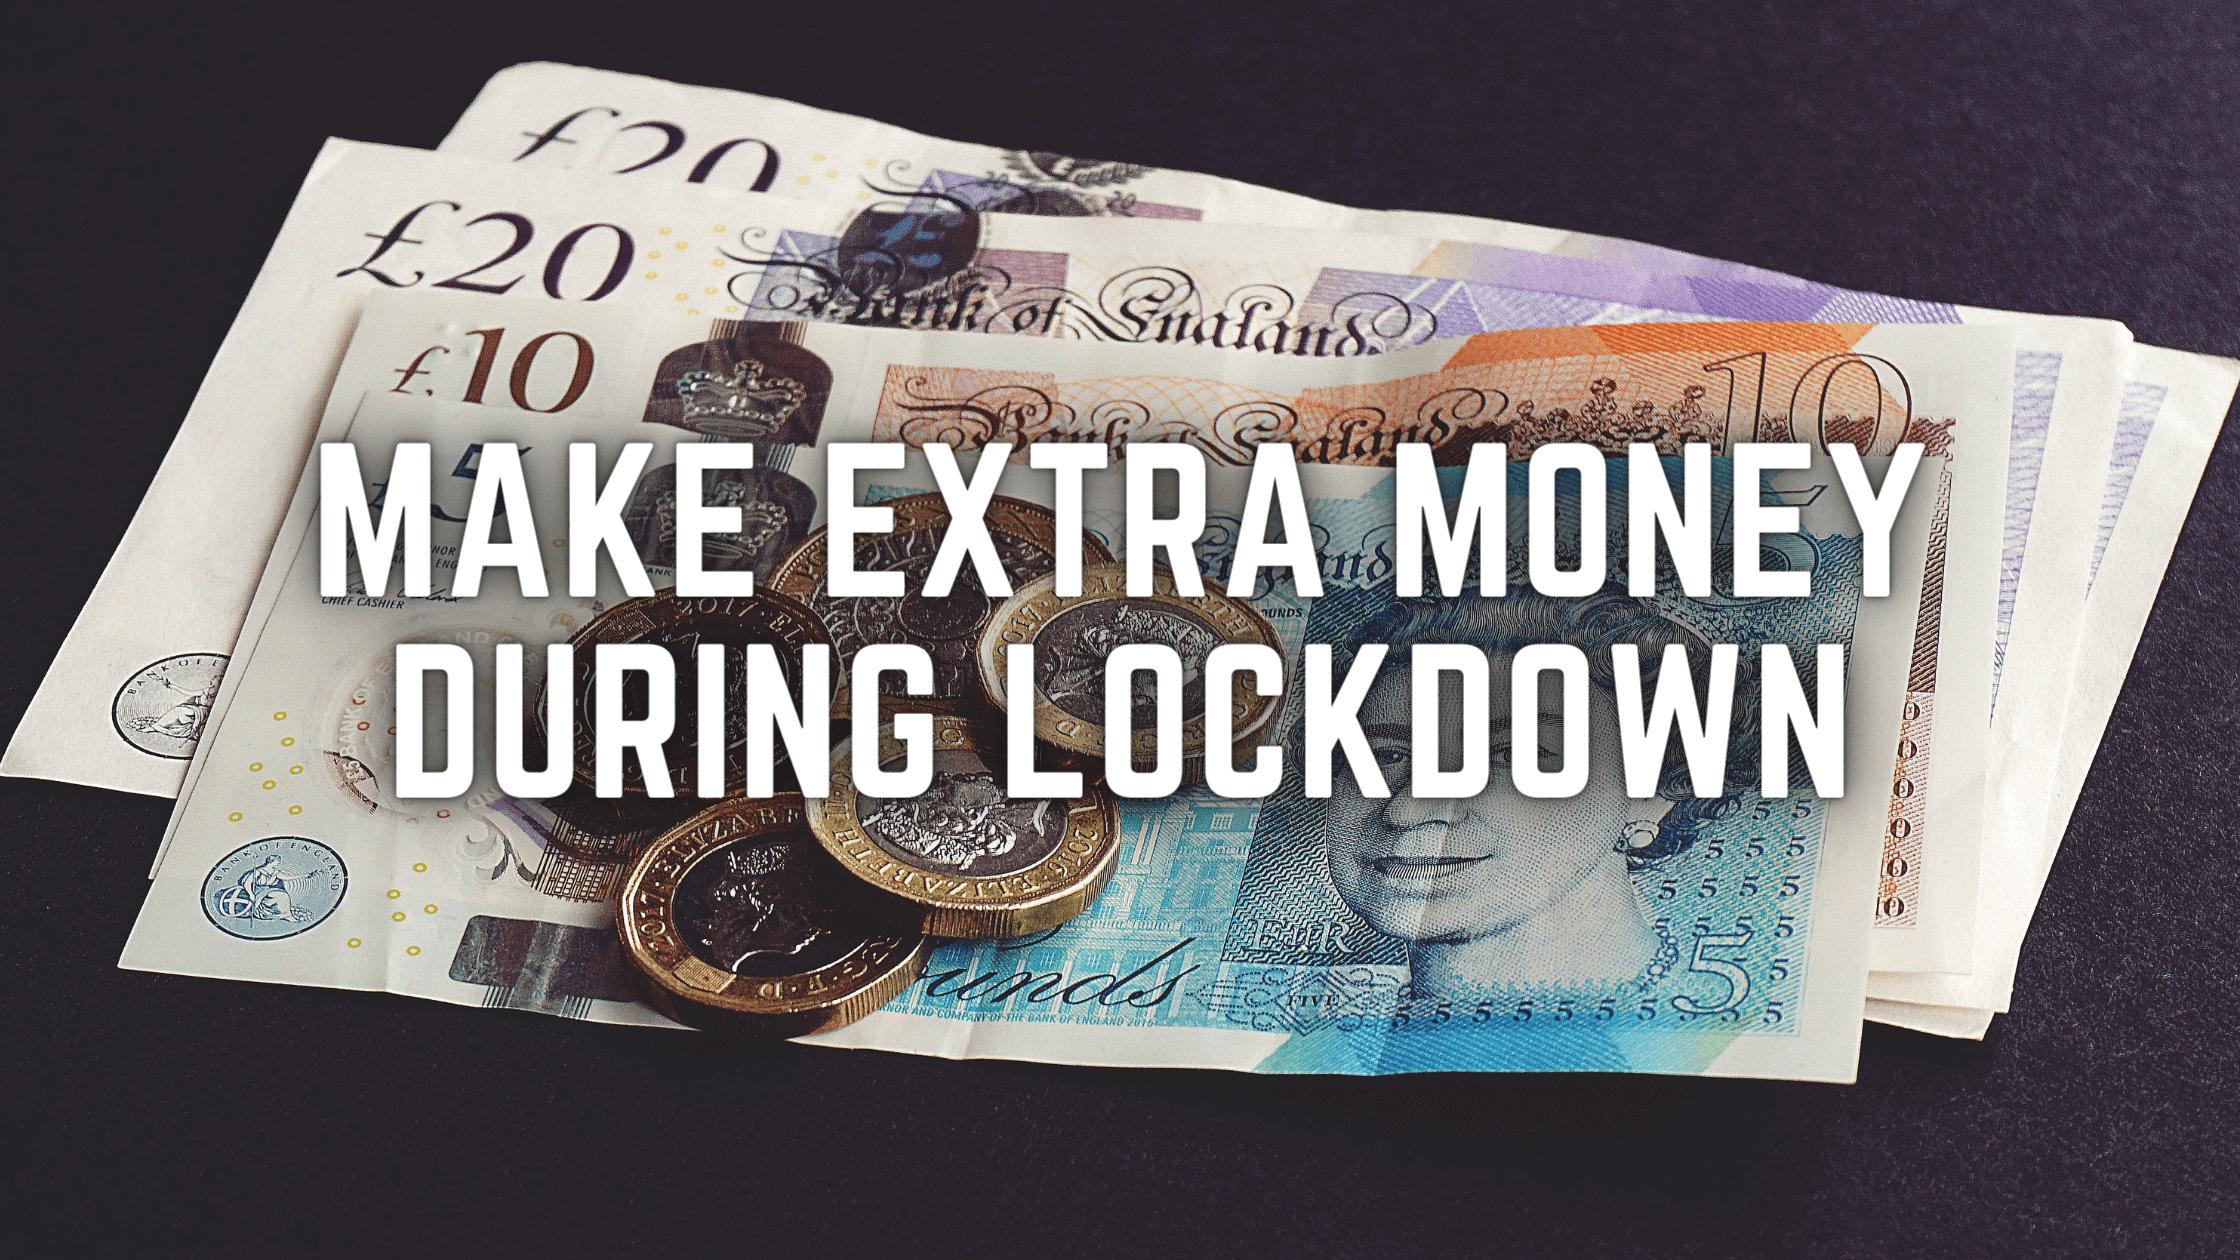 Make Extra Money During Lockdown